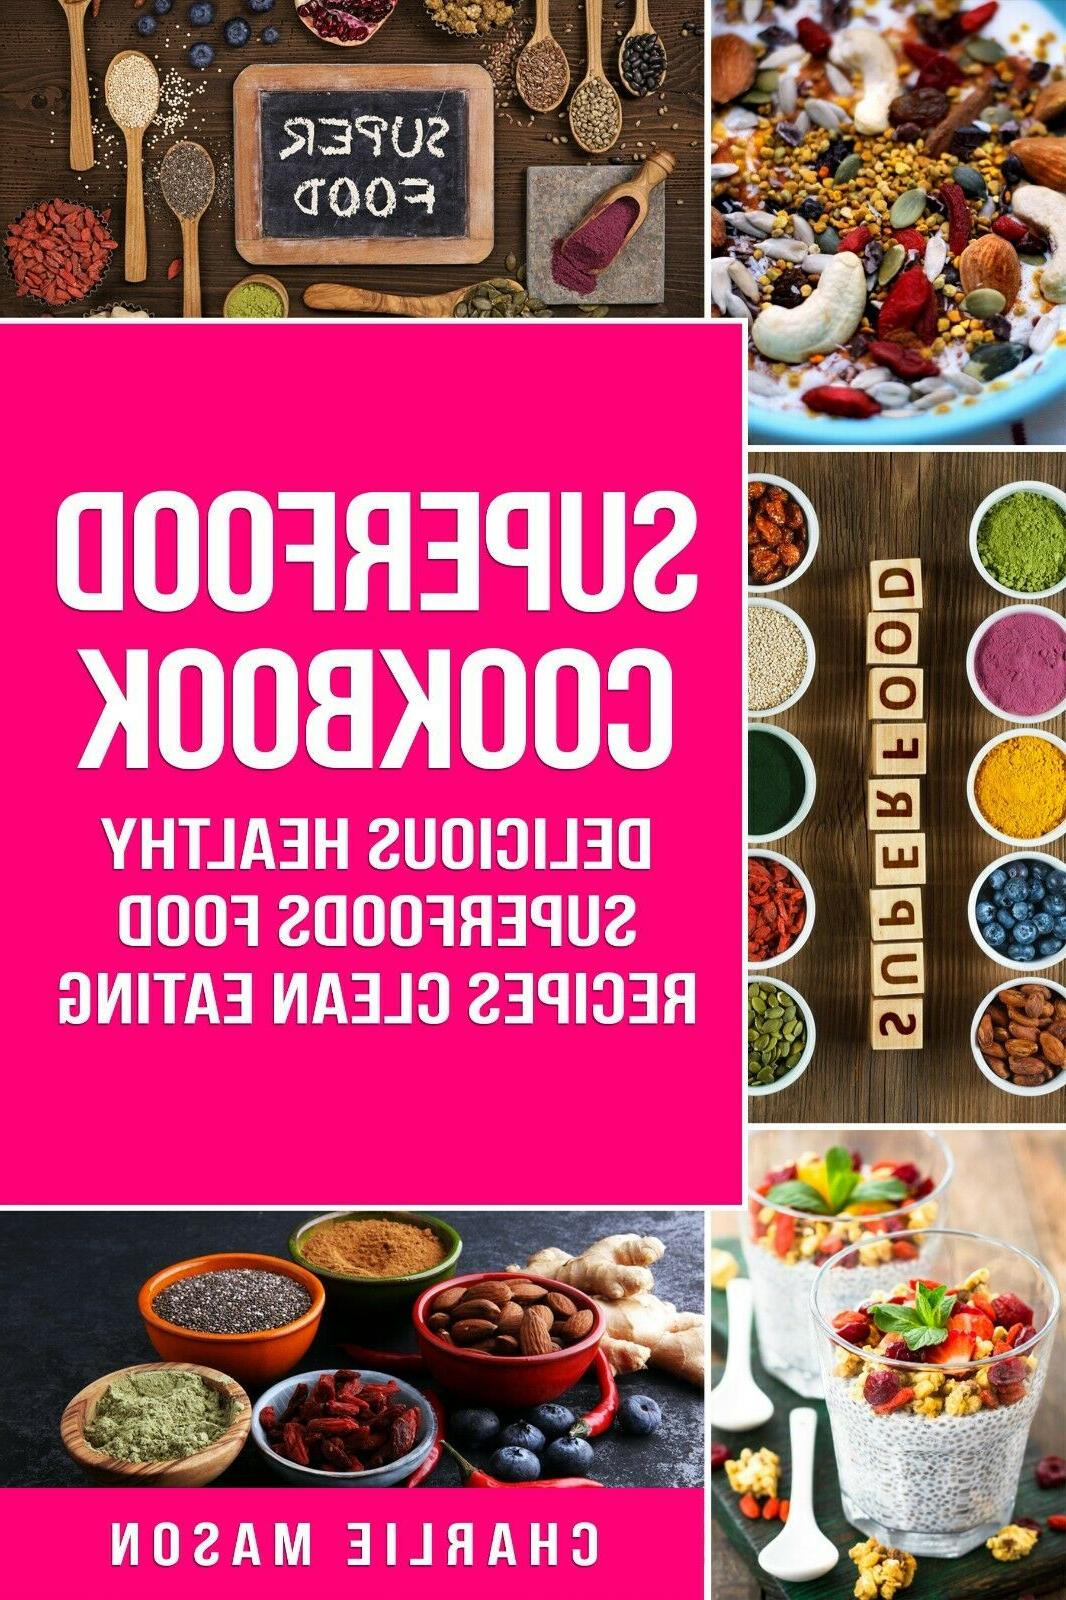 Vegetarian Recipes Cookbook Air fryer cookbook Vegan Slow